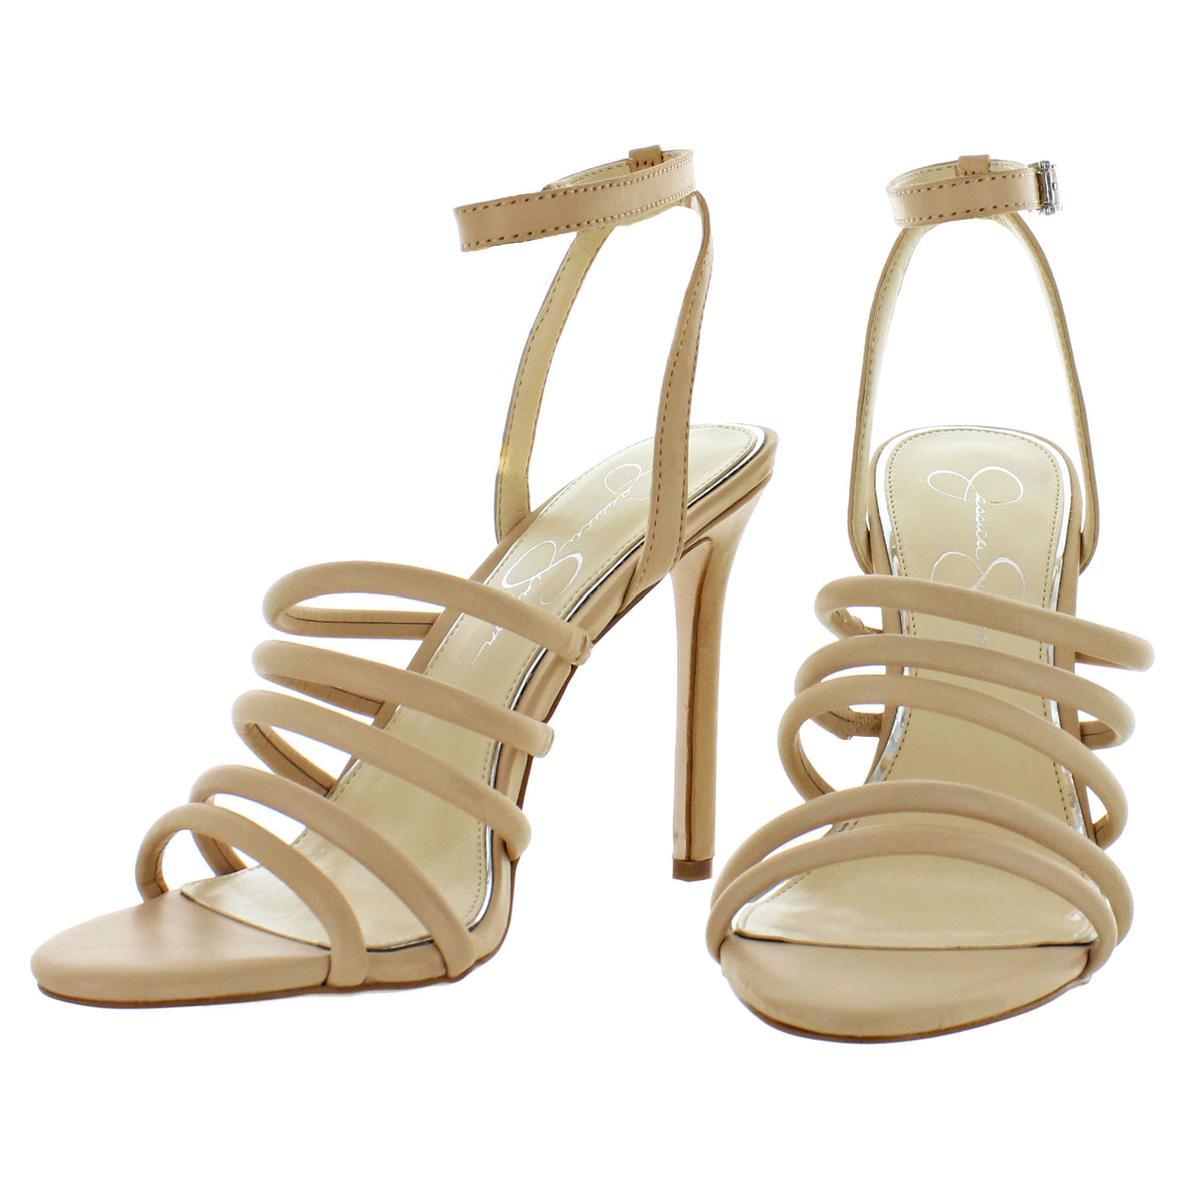 Jessica-Simpson-Femme-Joselle-a-Lanieres-Talon-Haut-Robe-Sandales-Chaussures-BHFO-7879 miniature 12